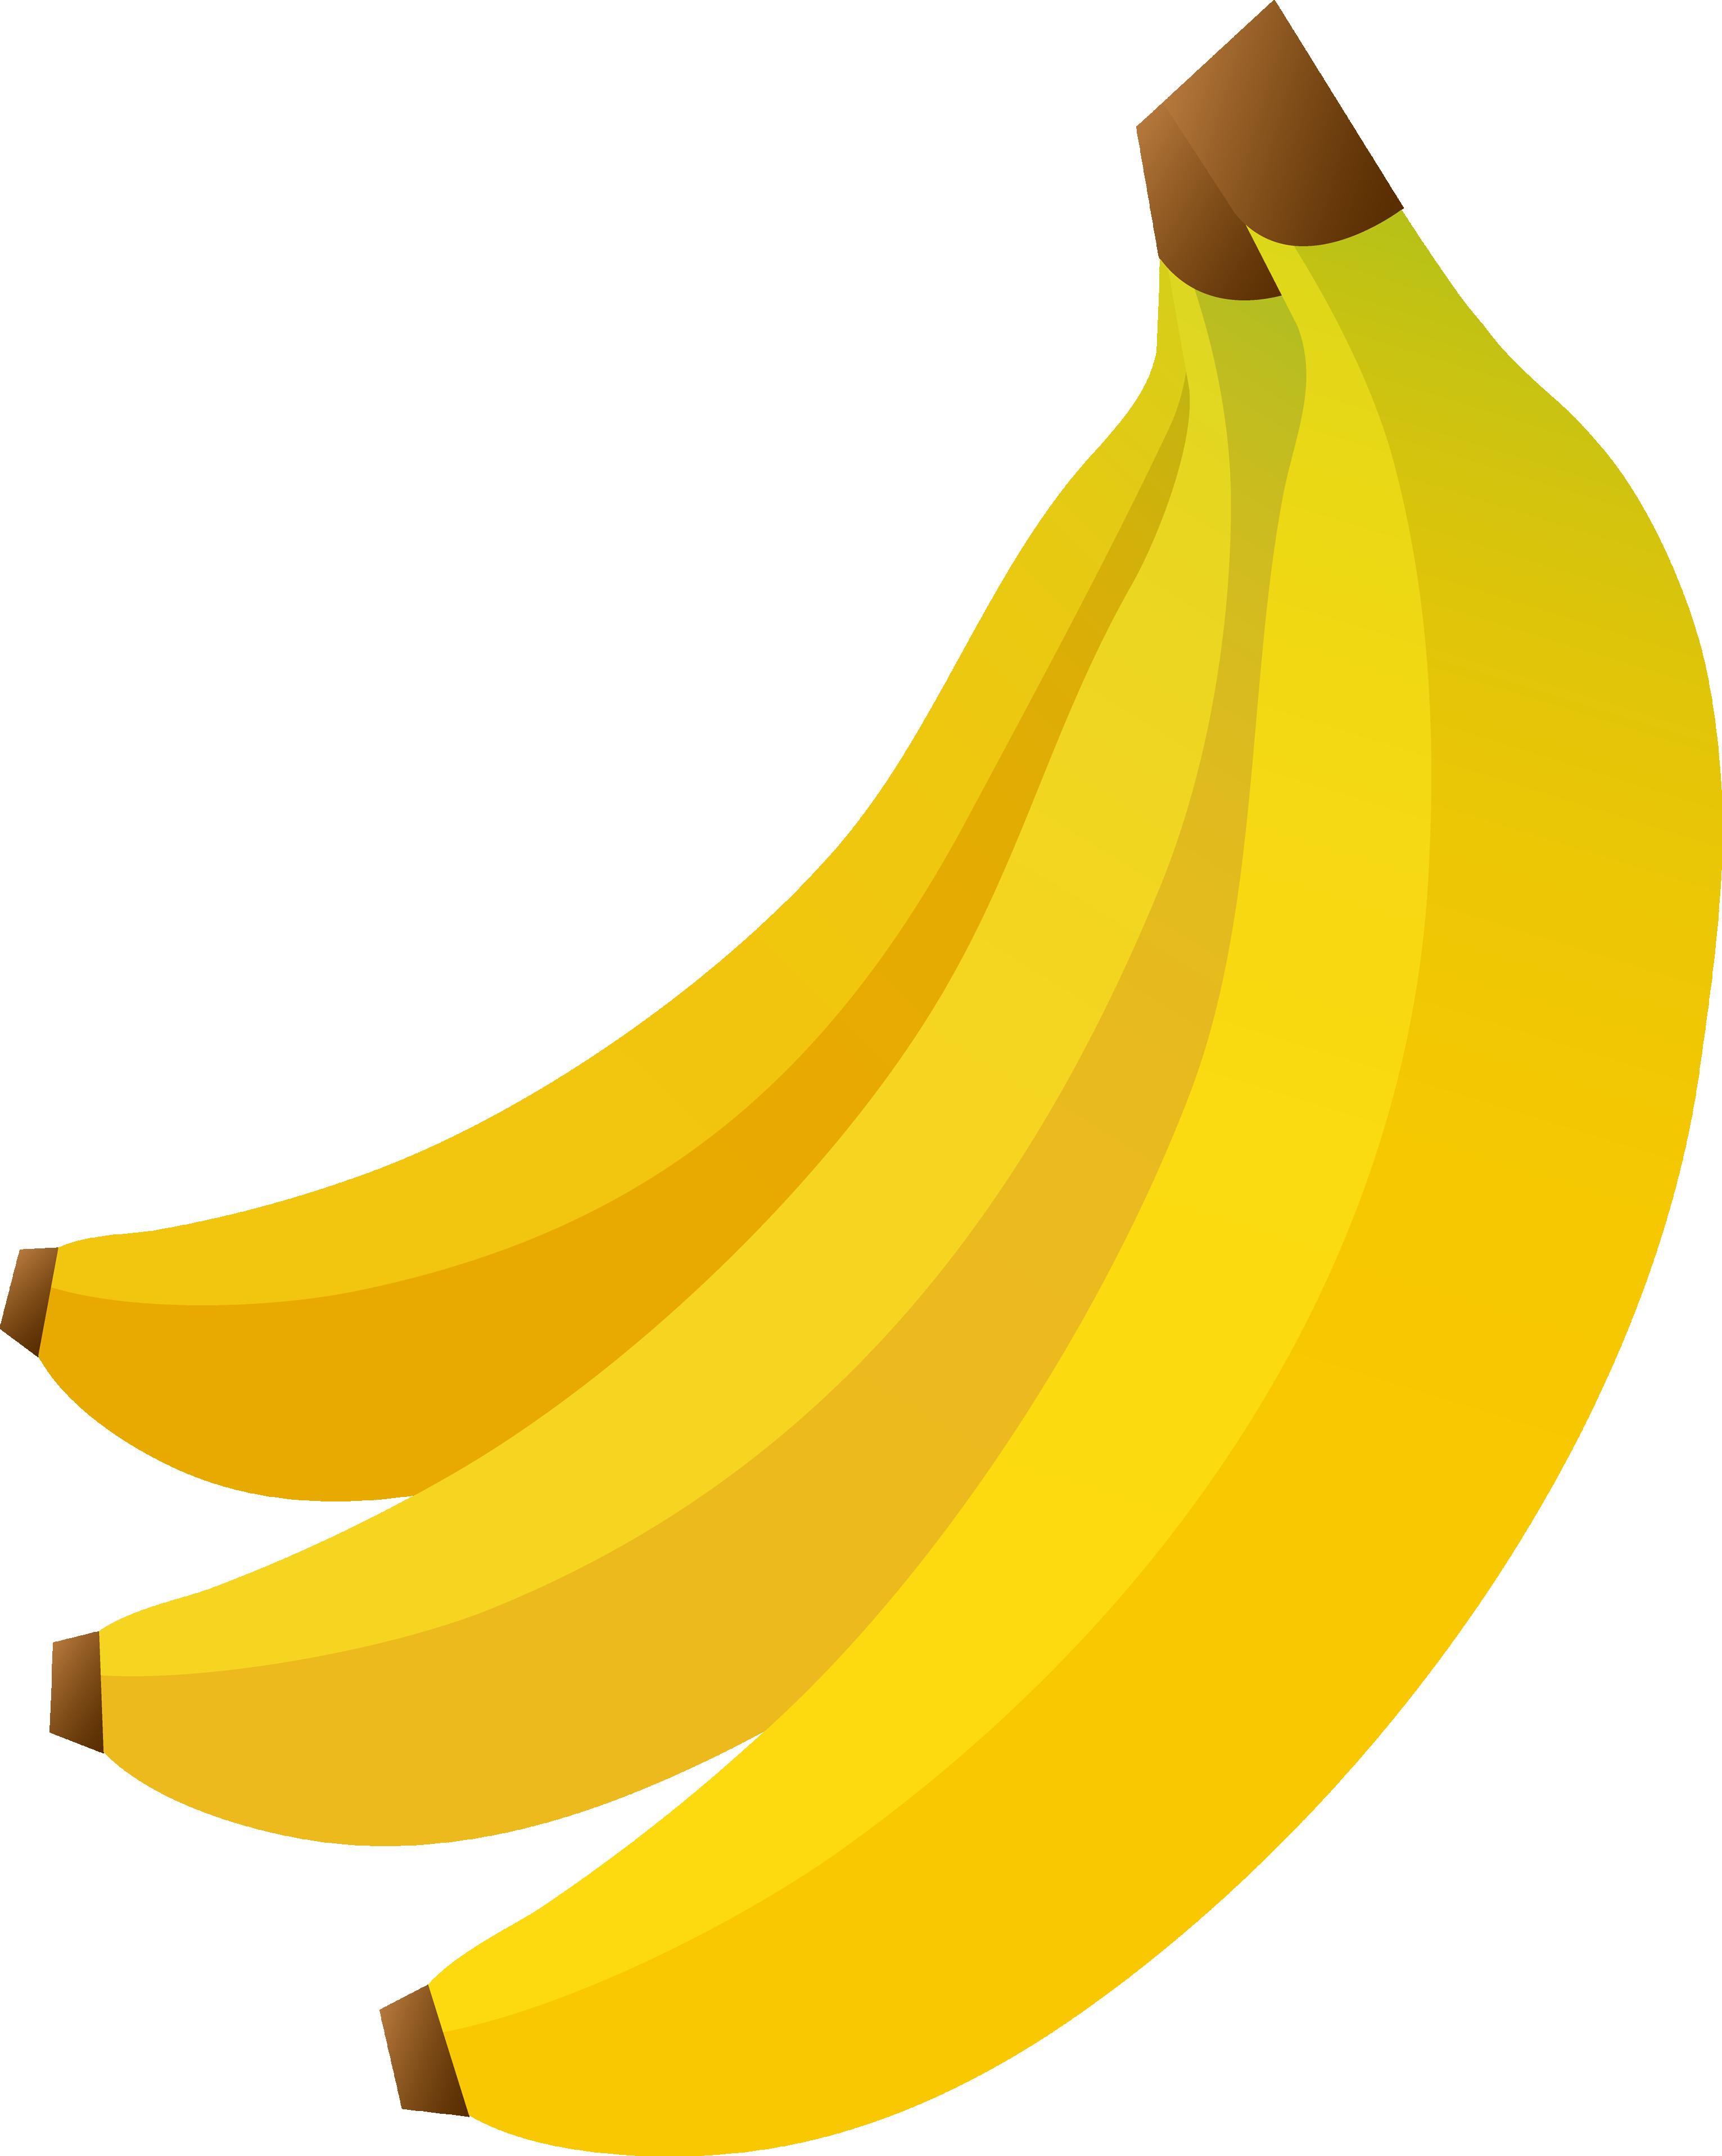 Banana clipart color yellow Downloads image bananas PNG free